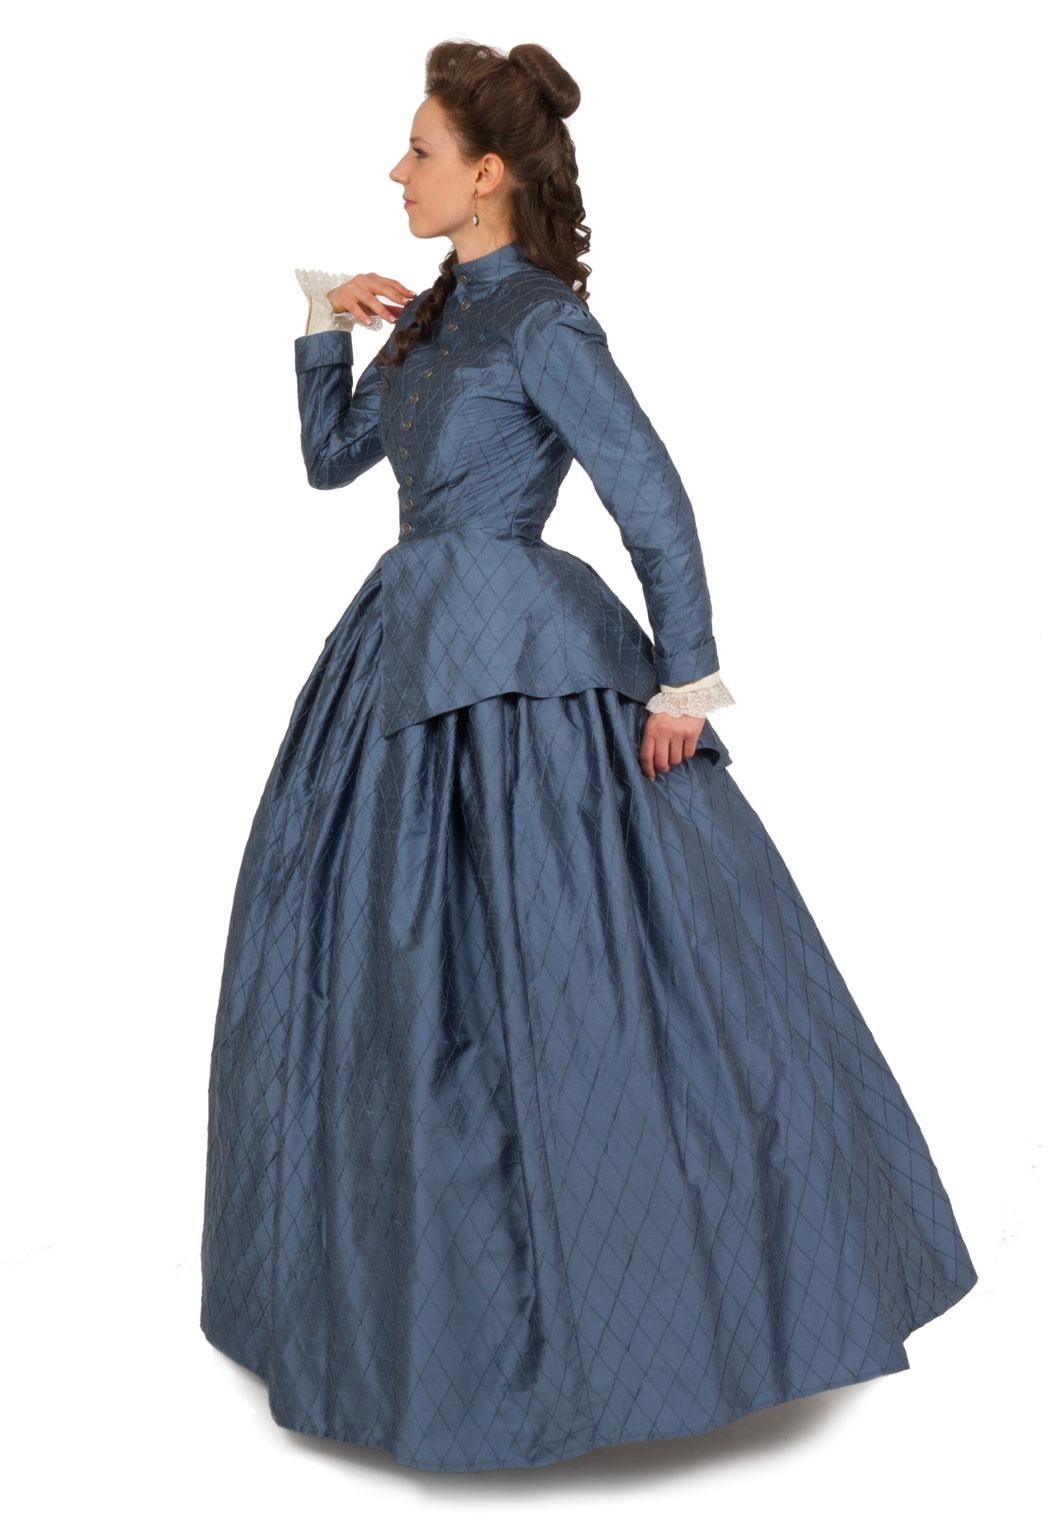 Old Fashion Victorian Dresses 82